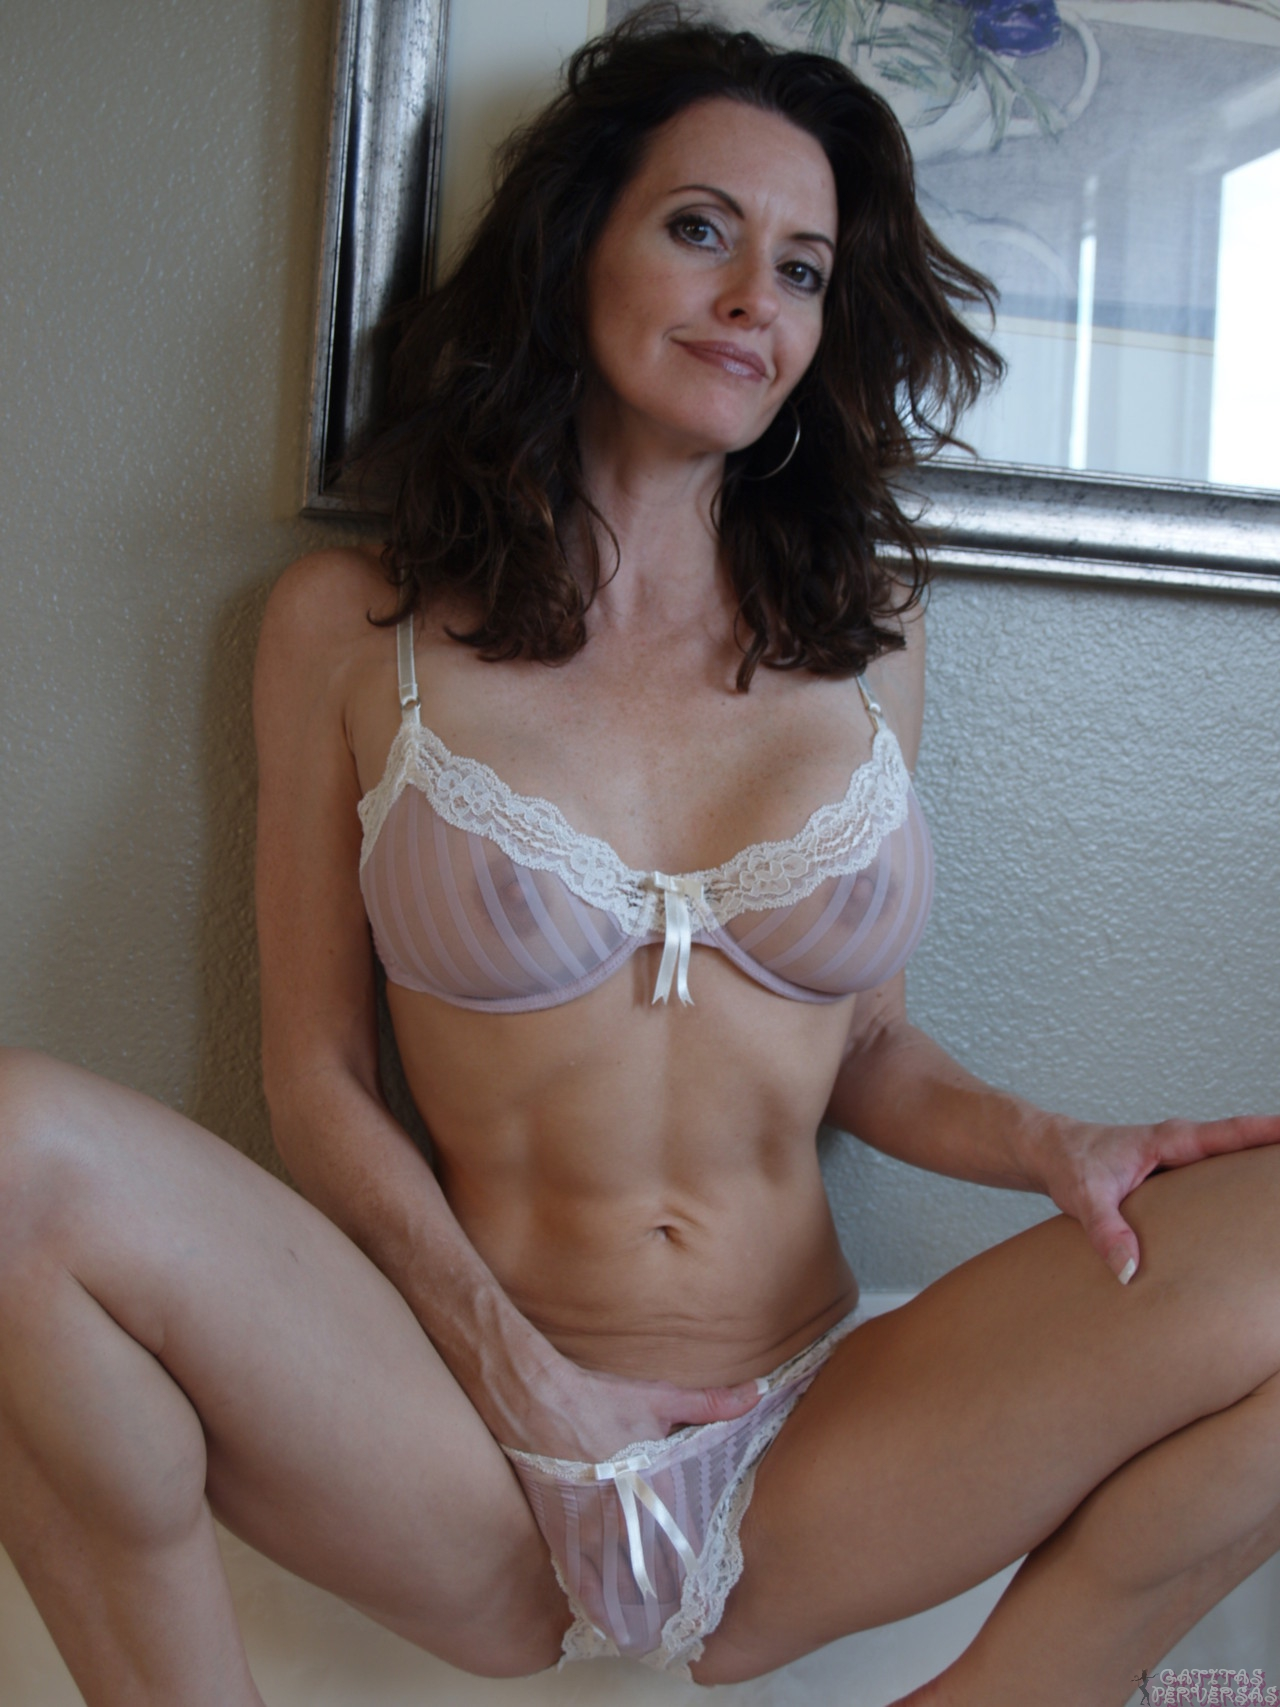 Albun Gratis De Chicas Desnudas imágenes demasiado hot de kelly divine - megapornx